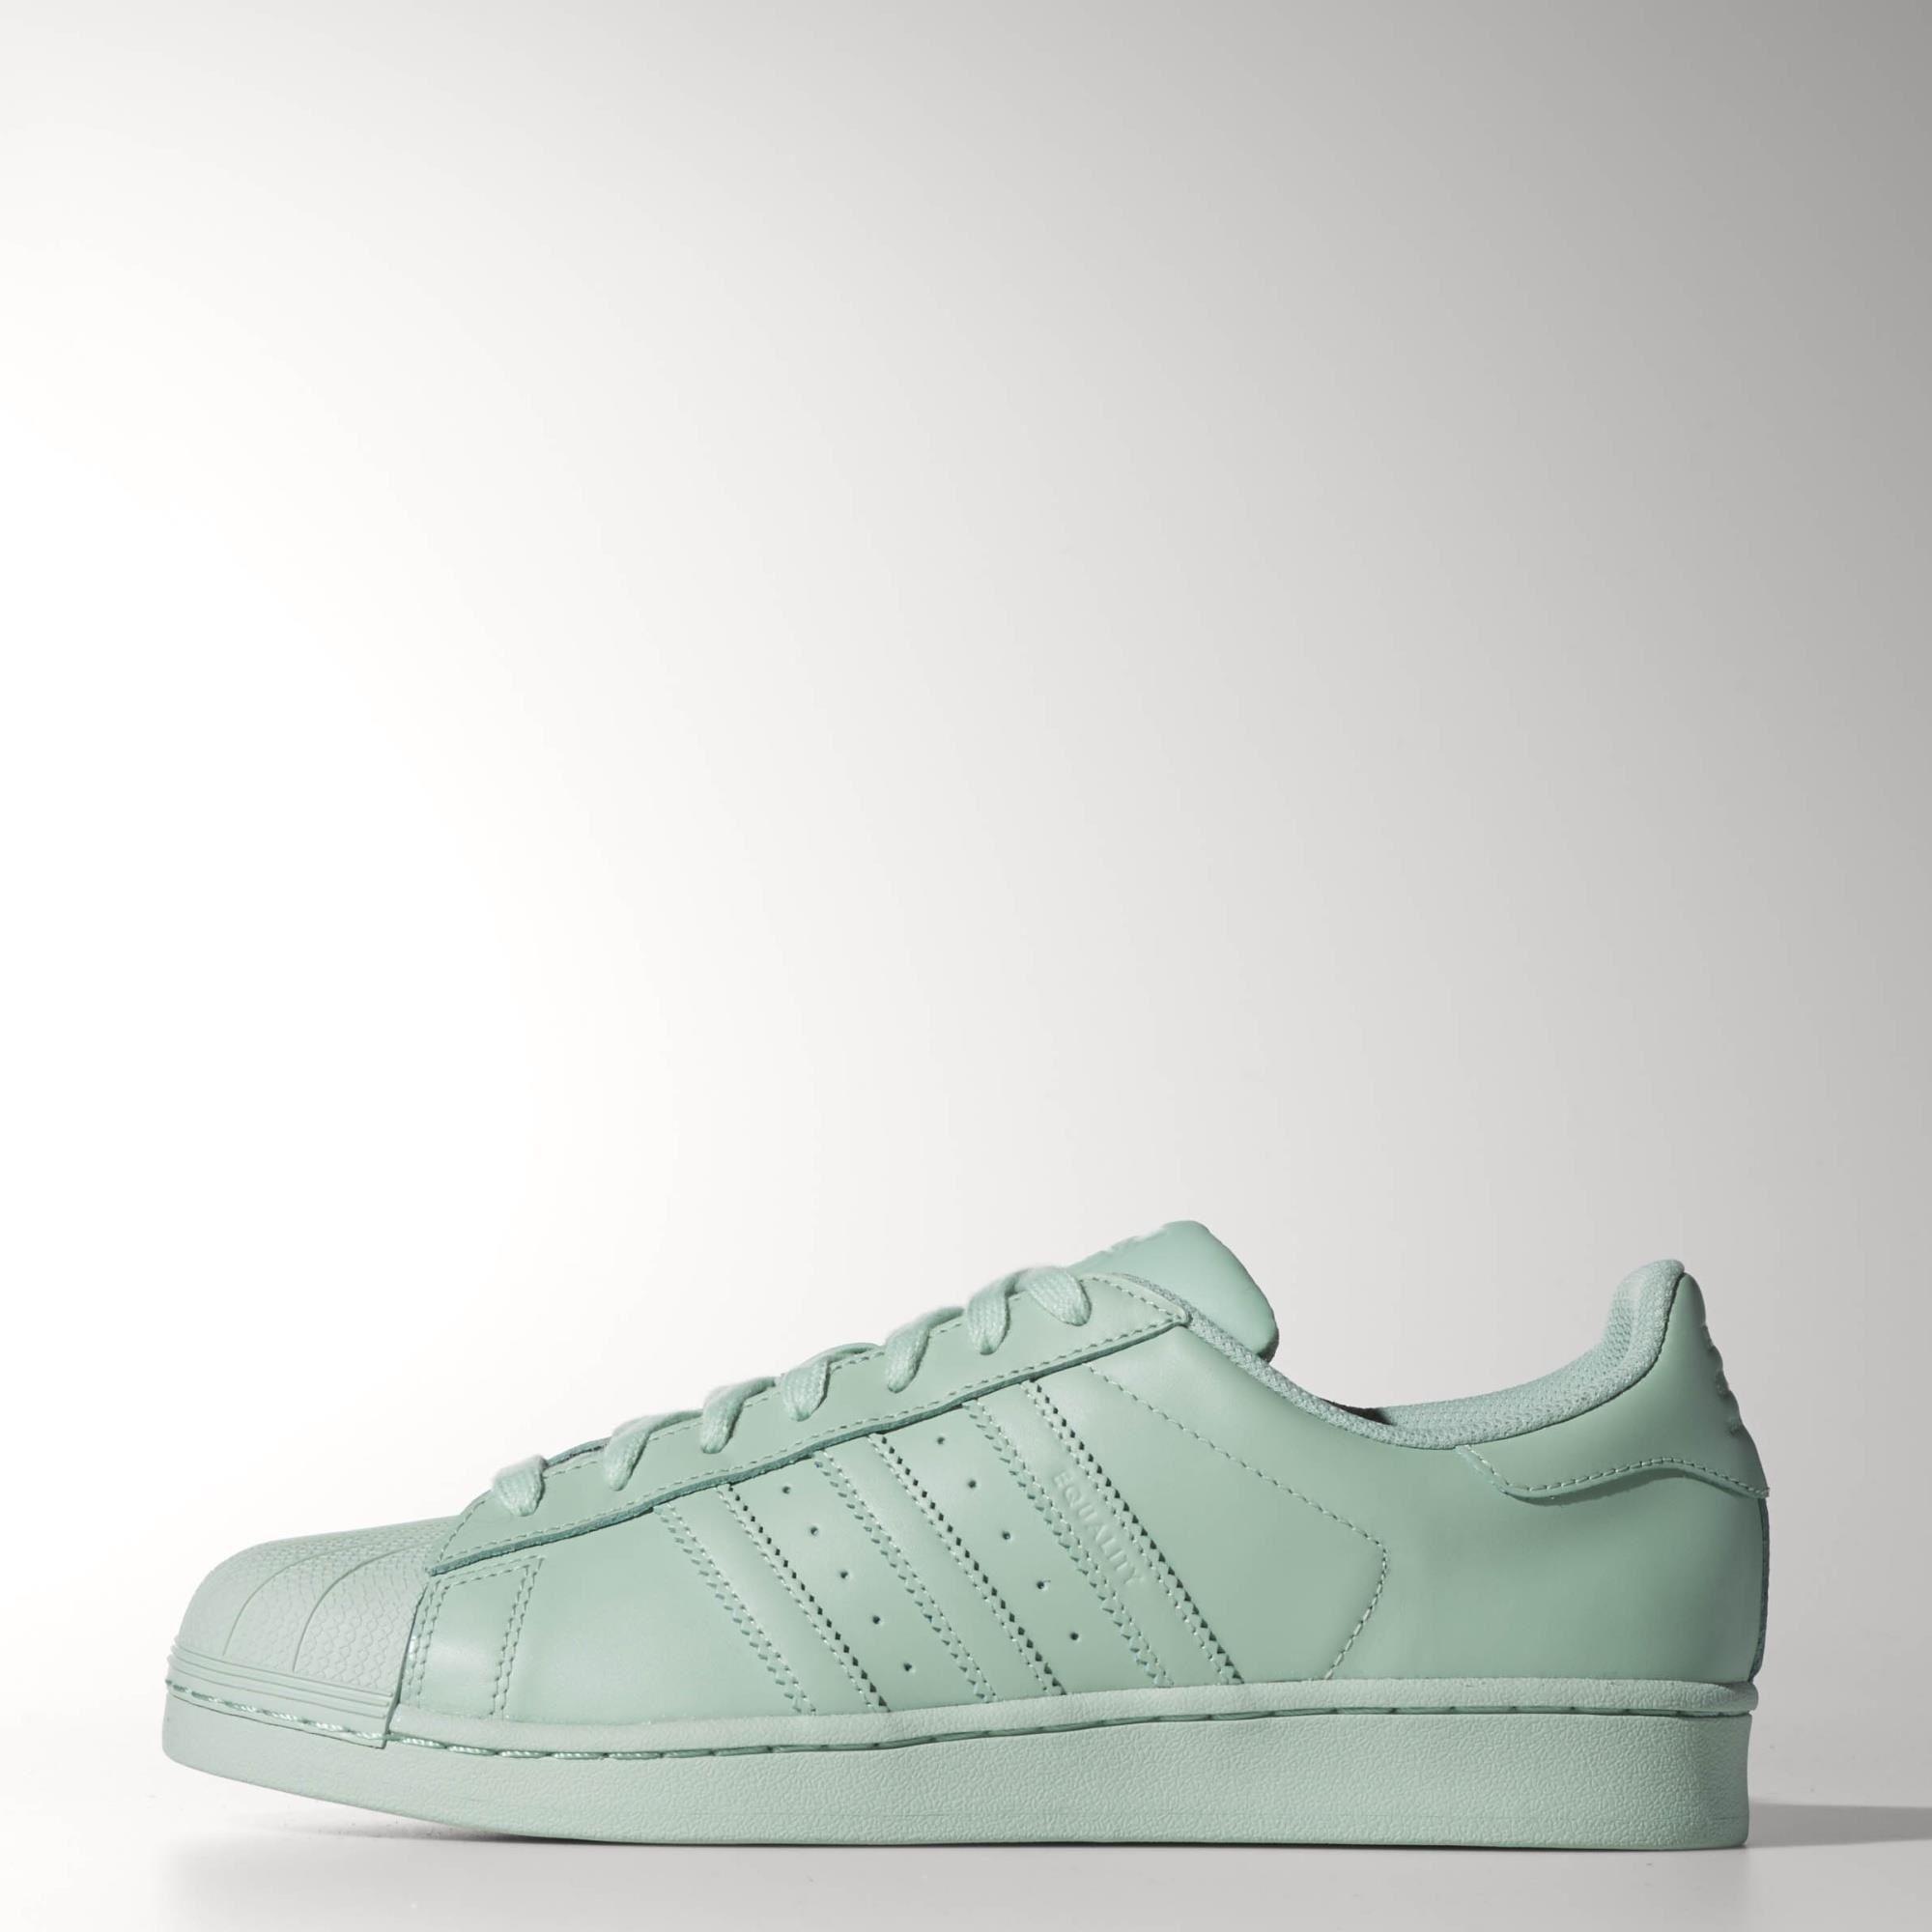 adidas Superstar Supercolor Pack Schuh